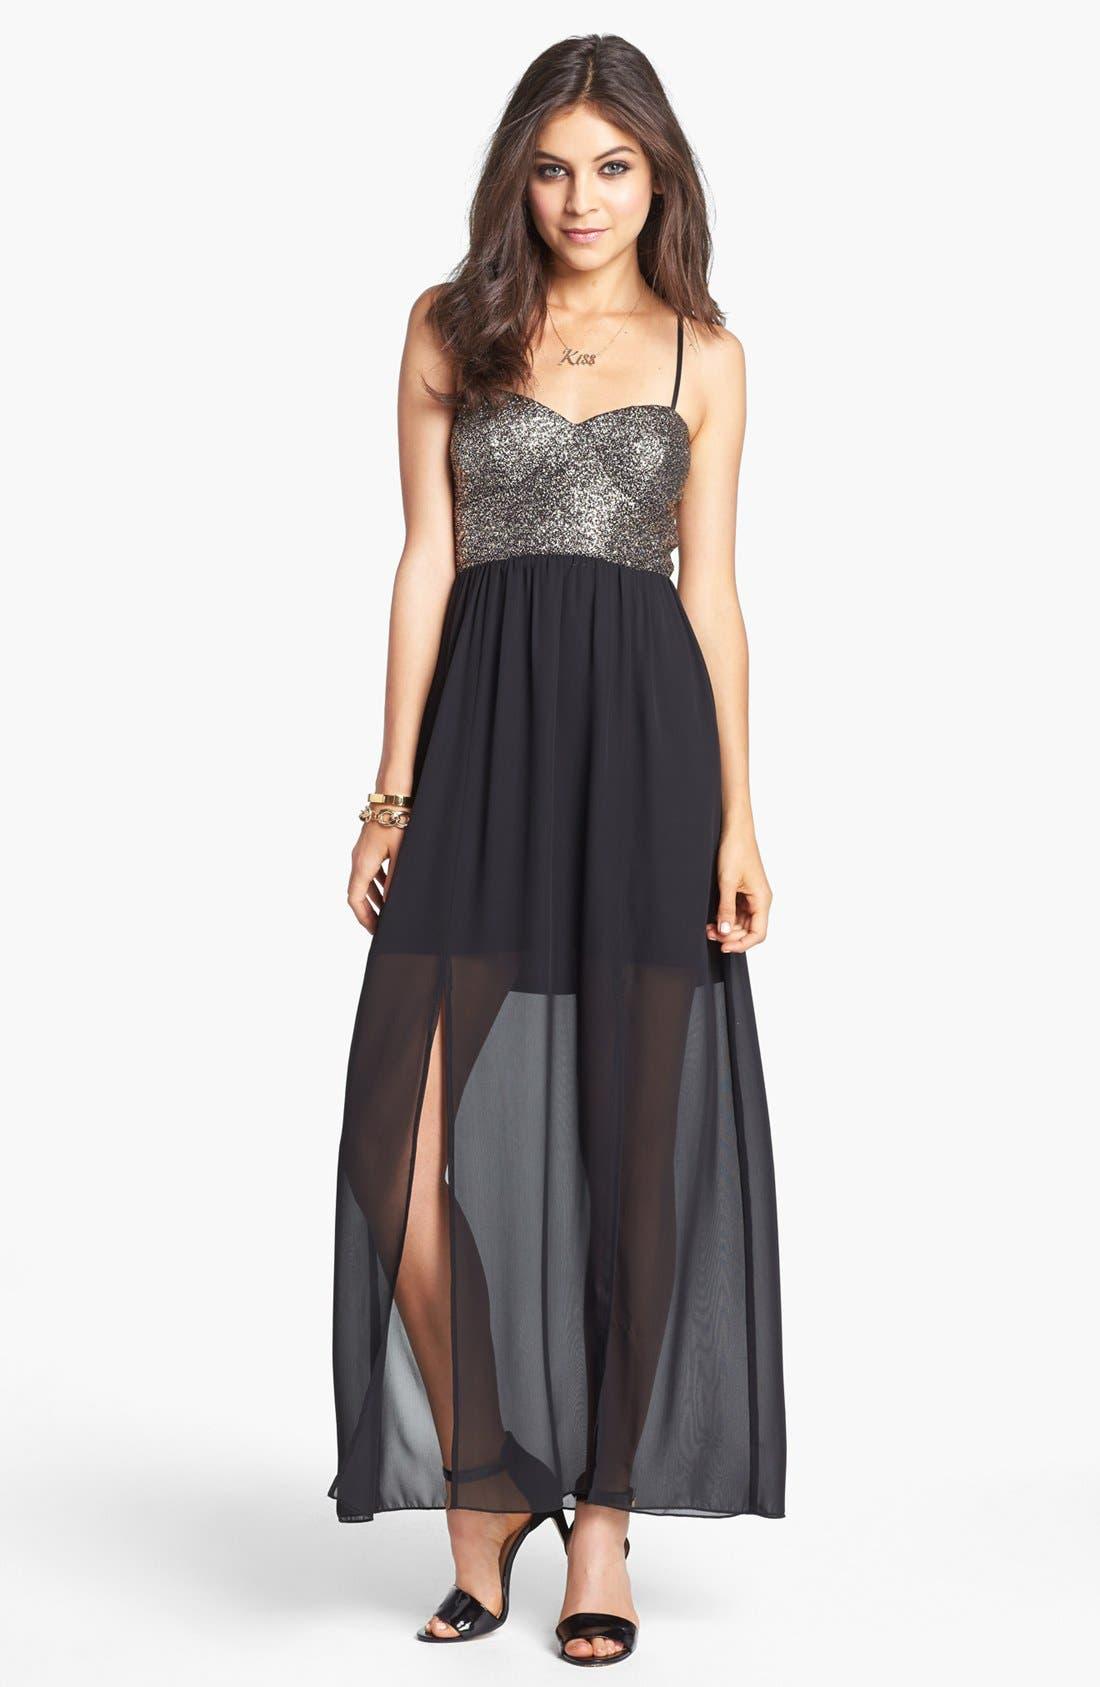 Alternate Image 1 Selected - Trixxi Cutout Back Glitter Bodice Maxi Dress (Juniors)